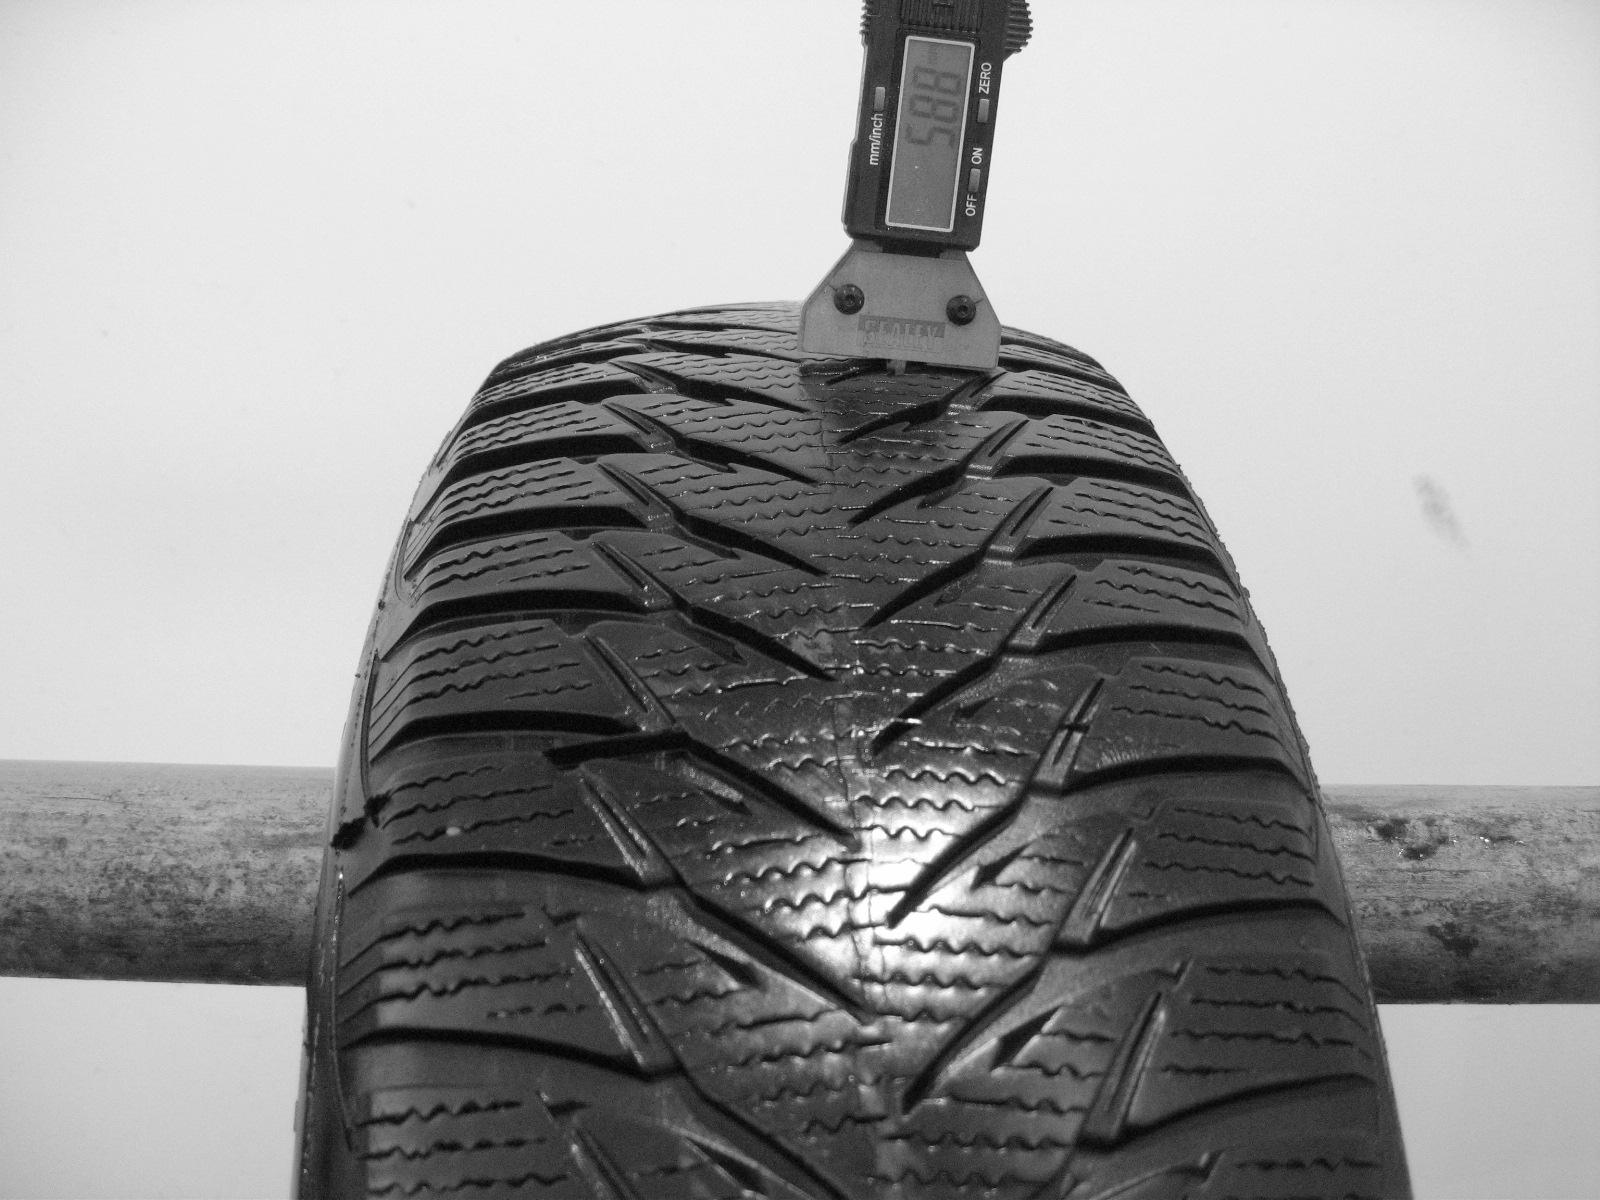 Použité-Pneu-Bazar - 195/65 R15 GOODYEAR ULTRAGRIP 8 -kusovka-rezerva 3mm